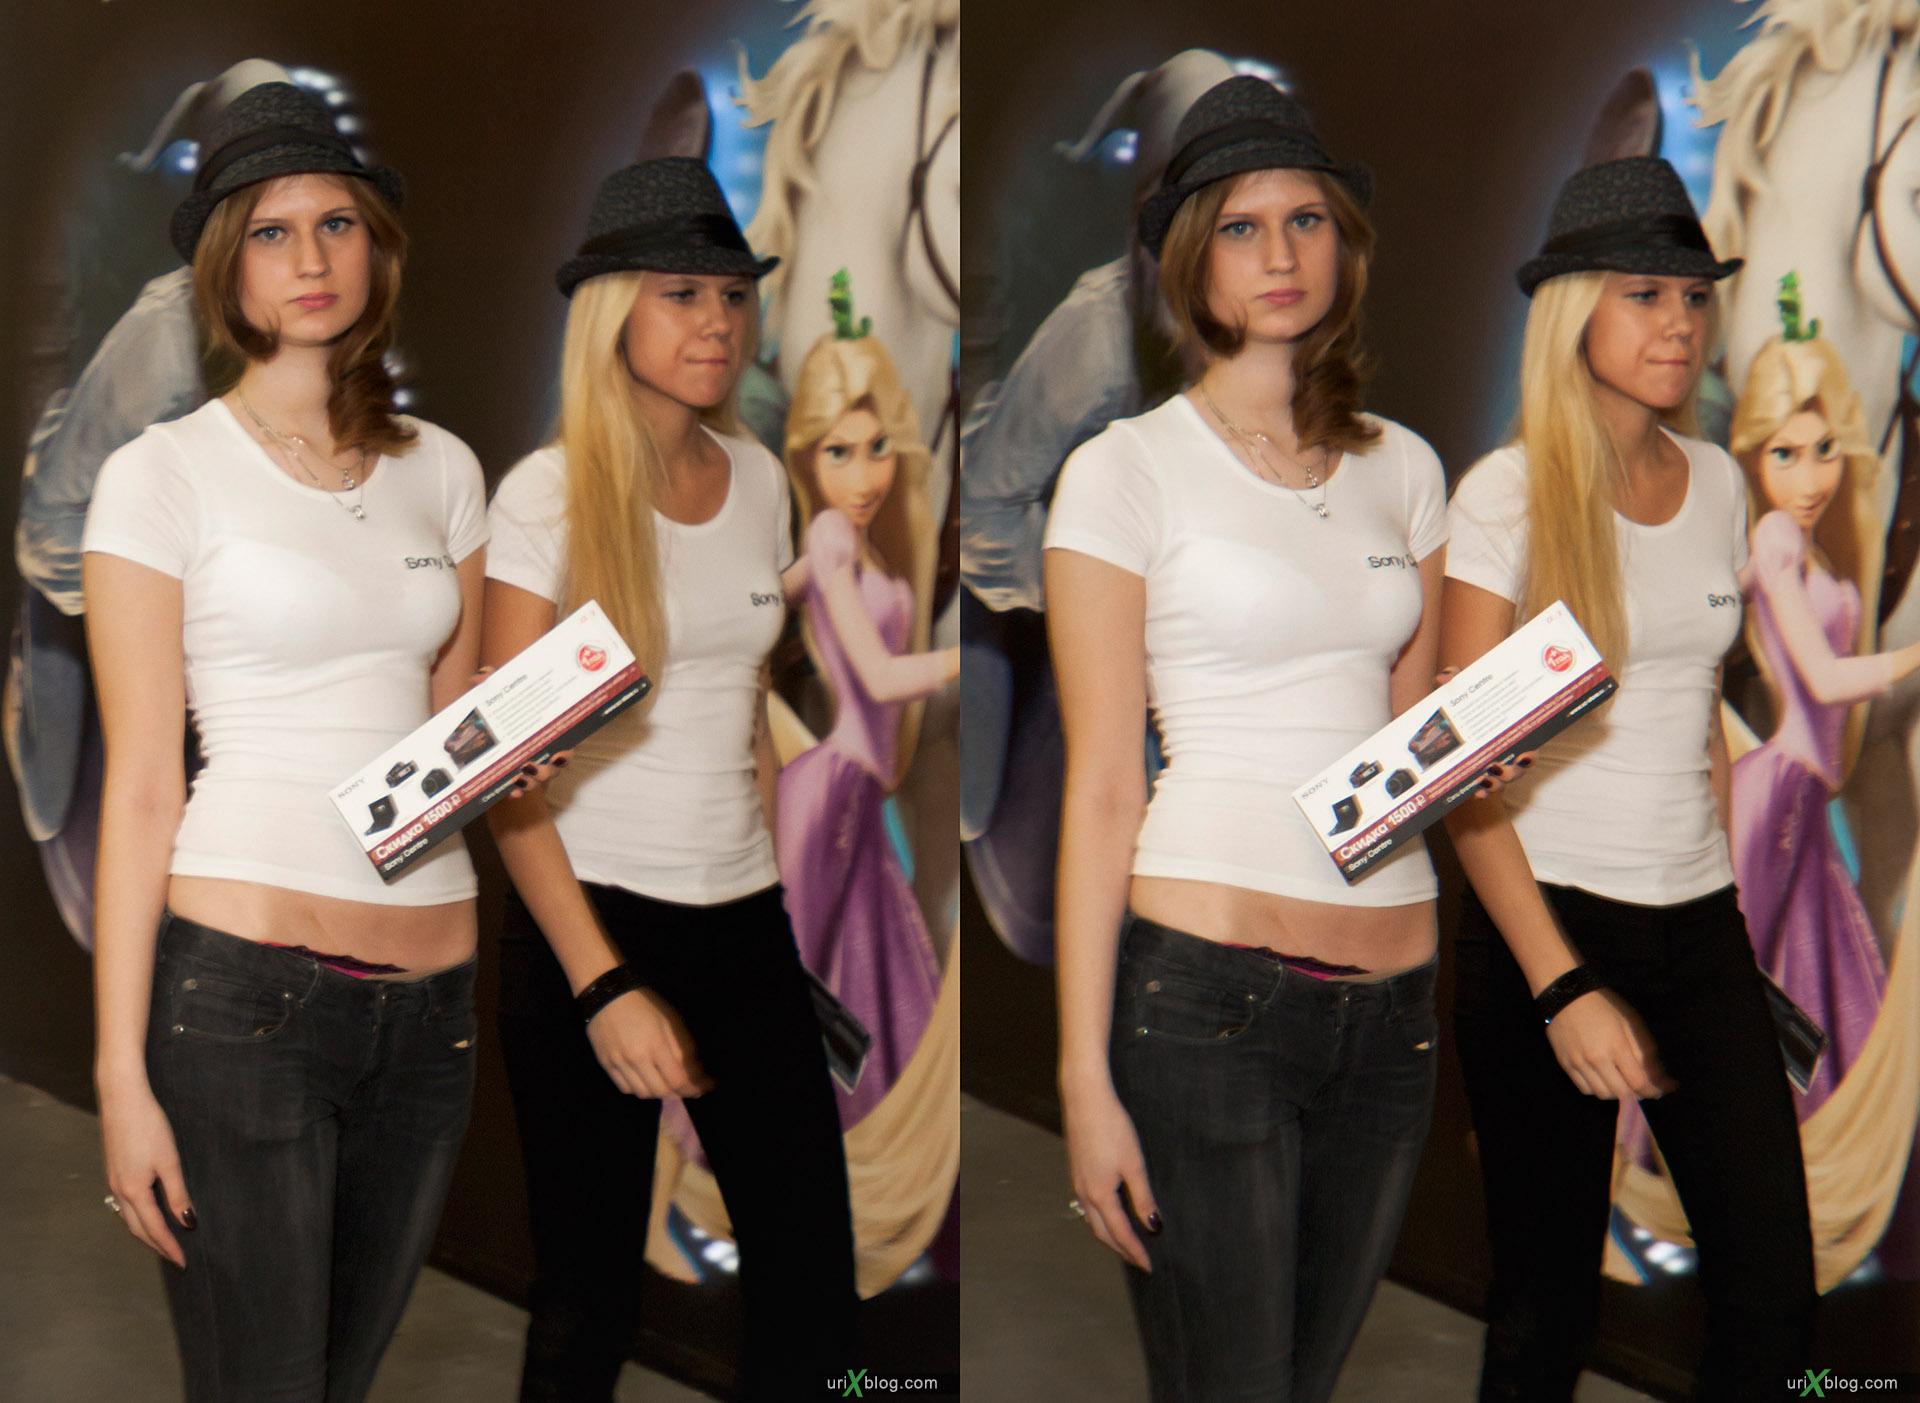 3D stereo stereo pair 3Д стерео Moscow, photoforum, 2011, Москва, Фотофорум, Крокус Экспо